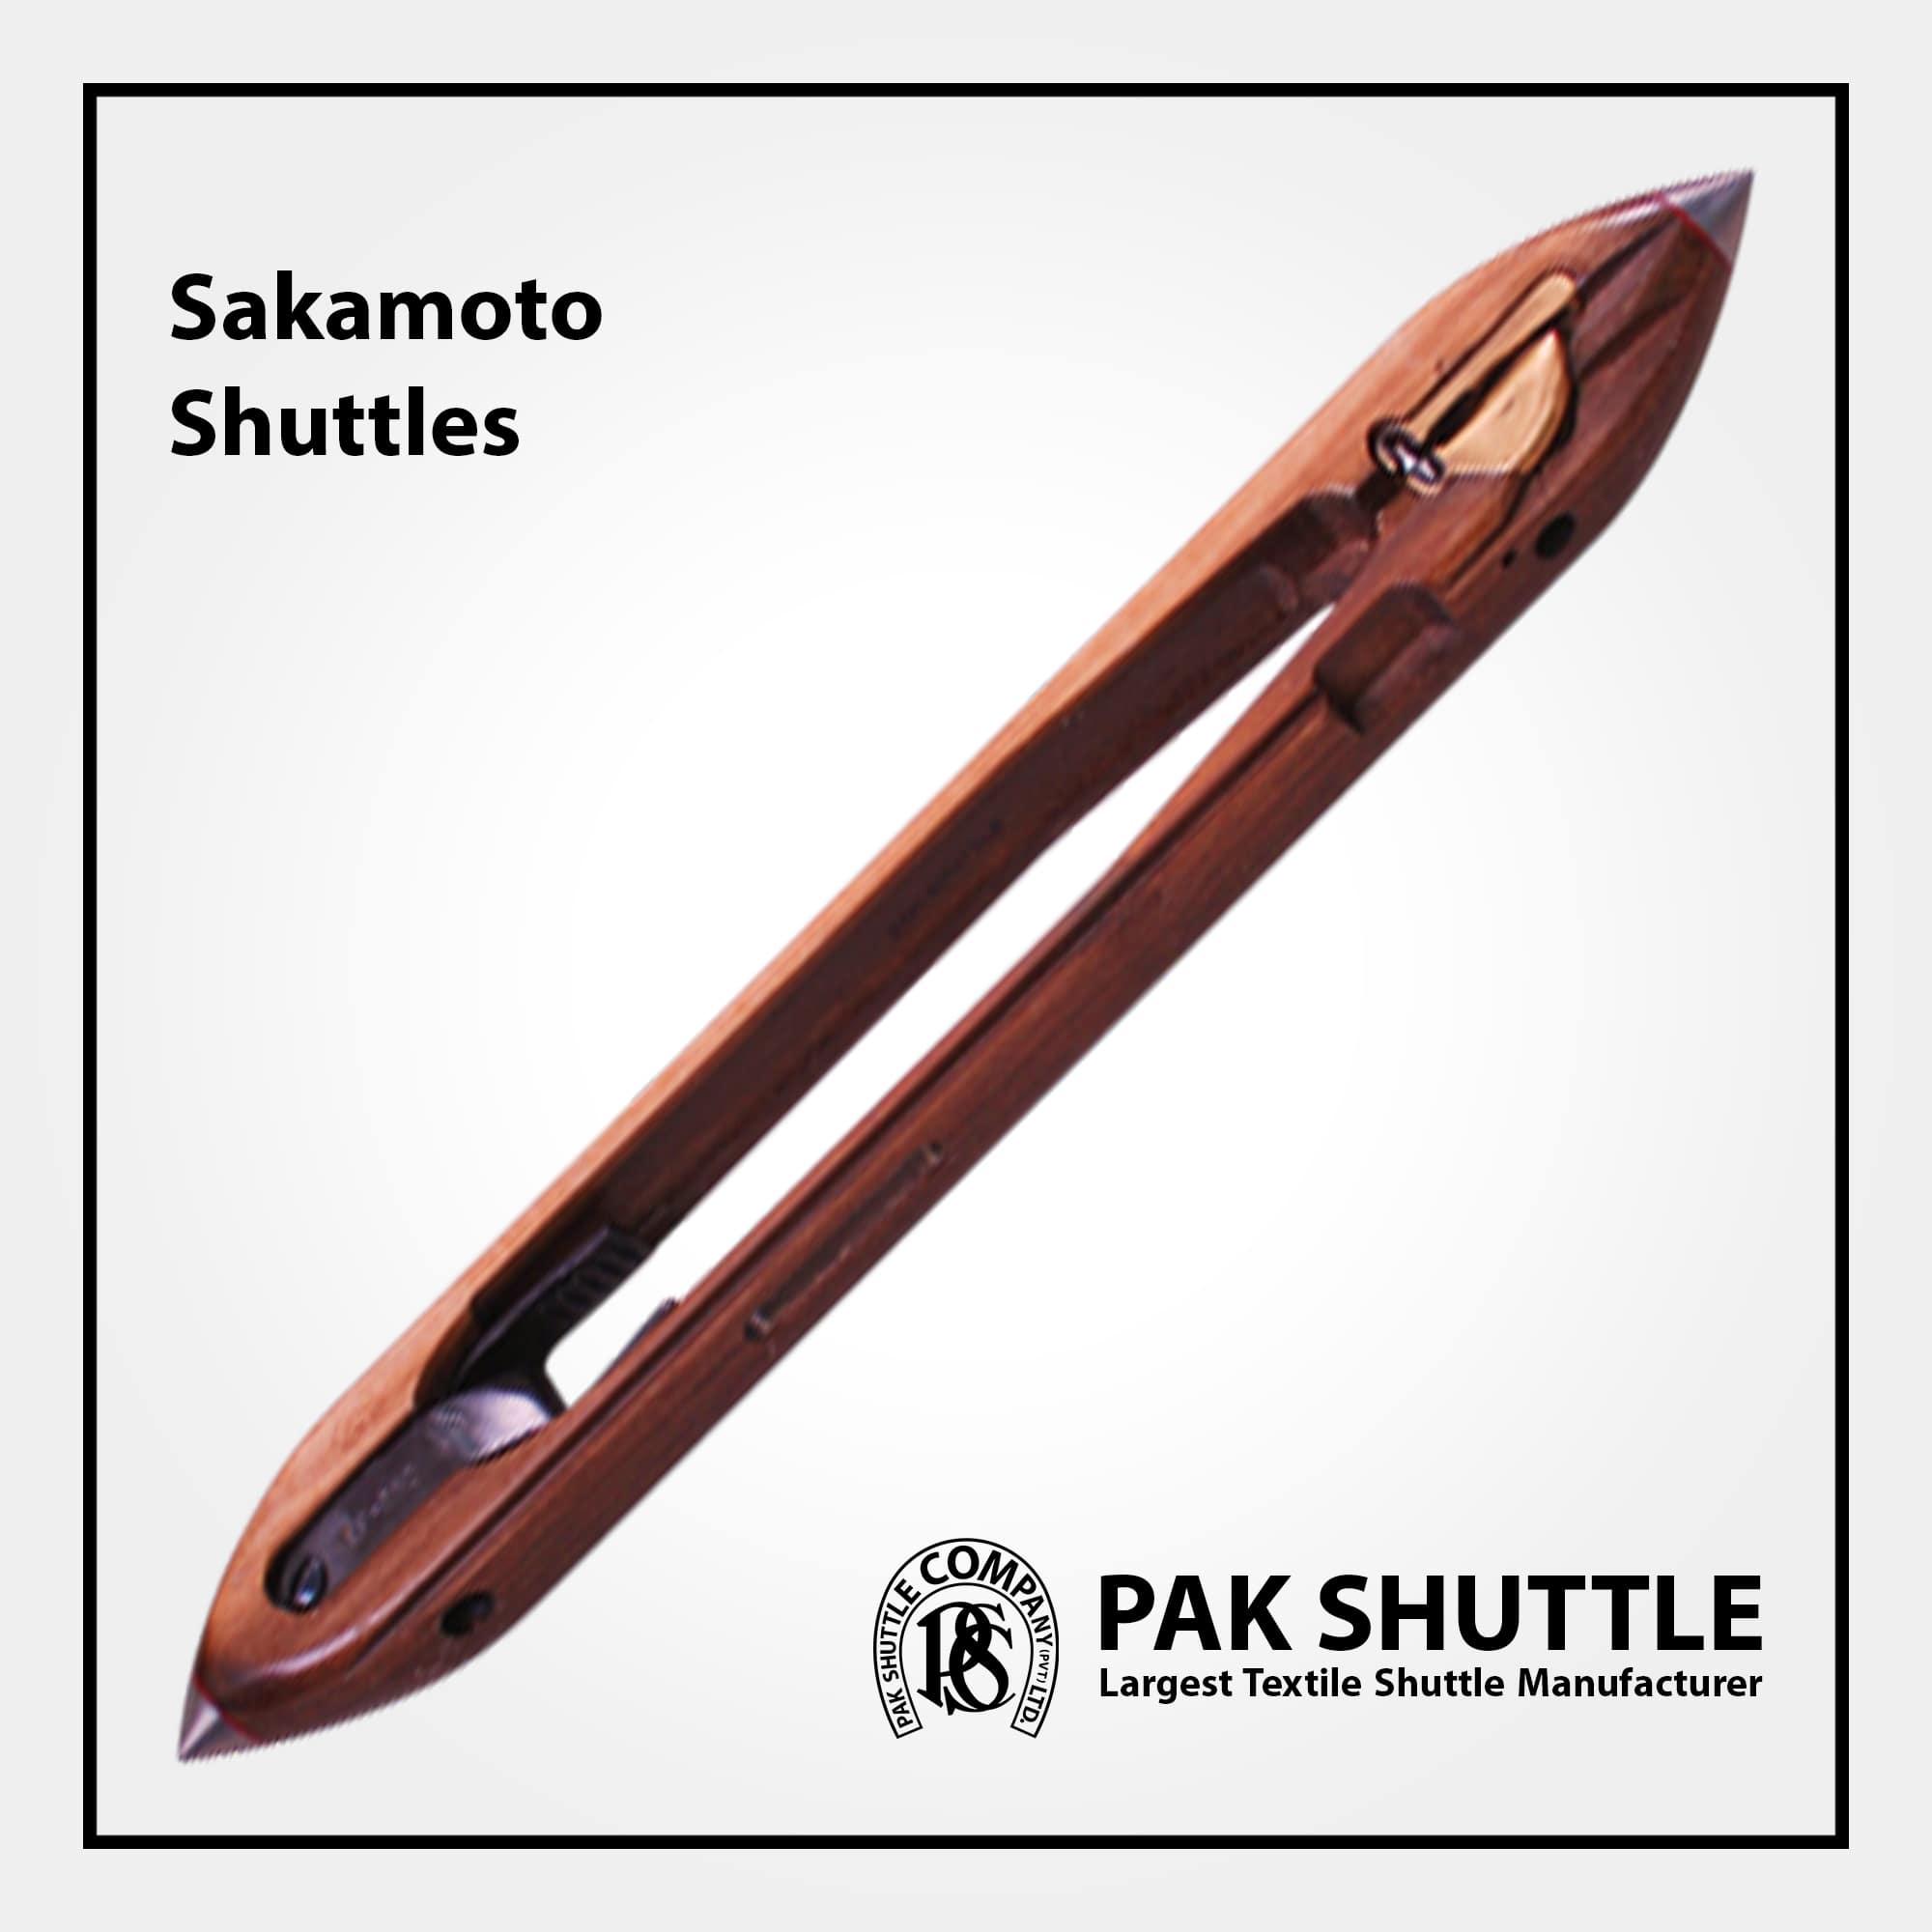 Sakamoto Shuttle by Pak Shuttle Company Pvt Ltd.